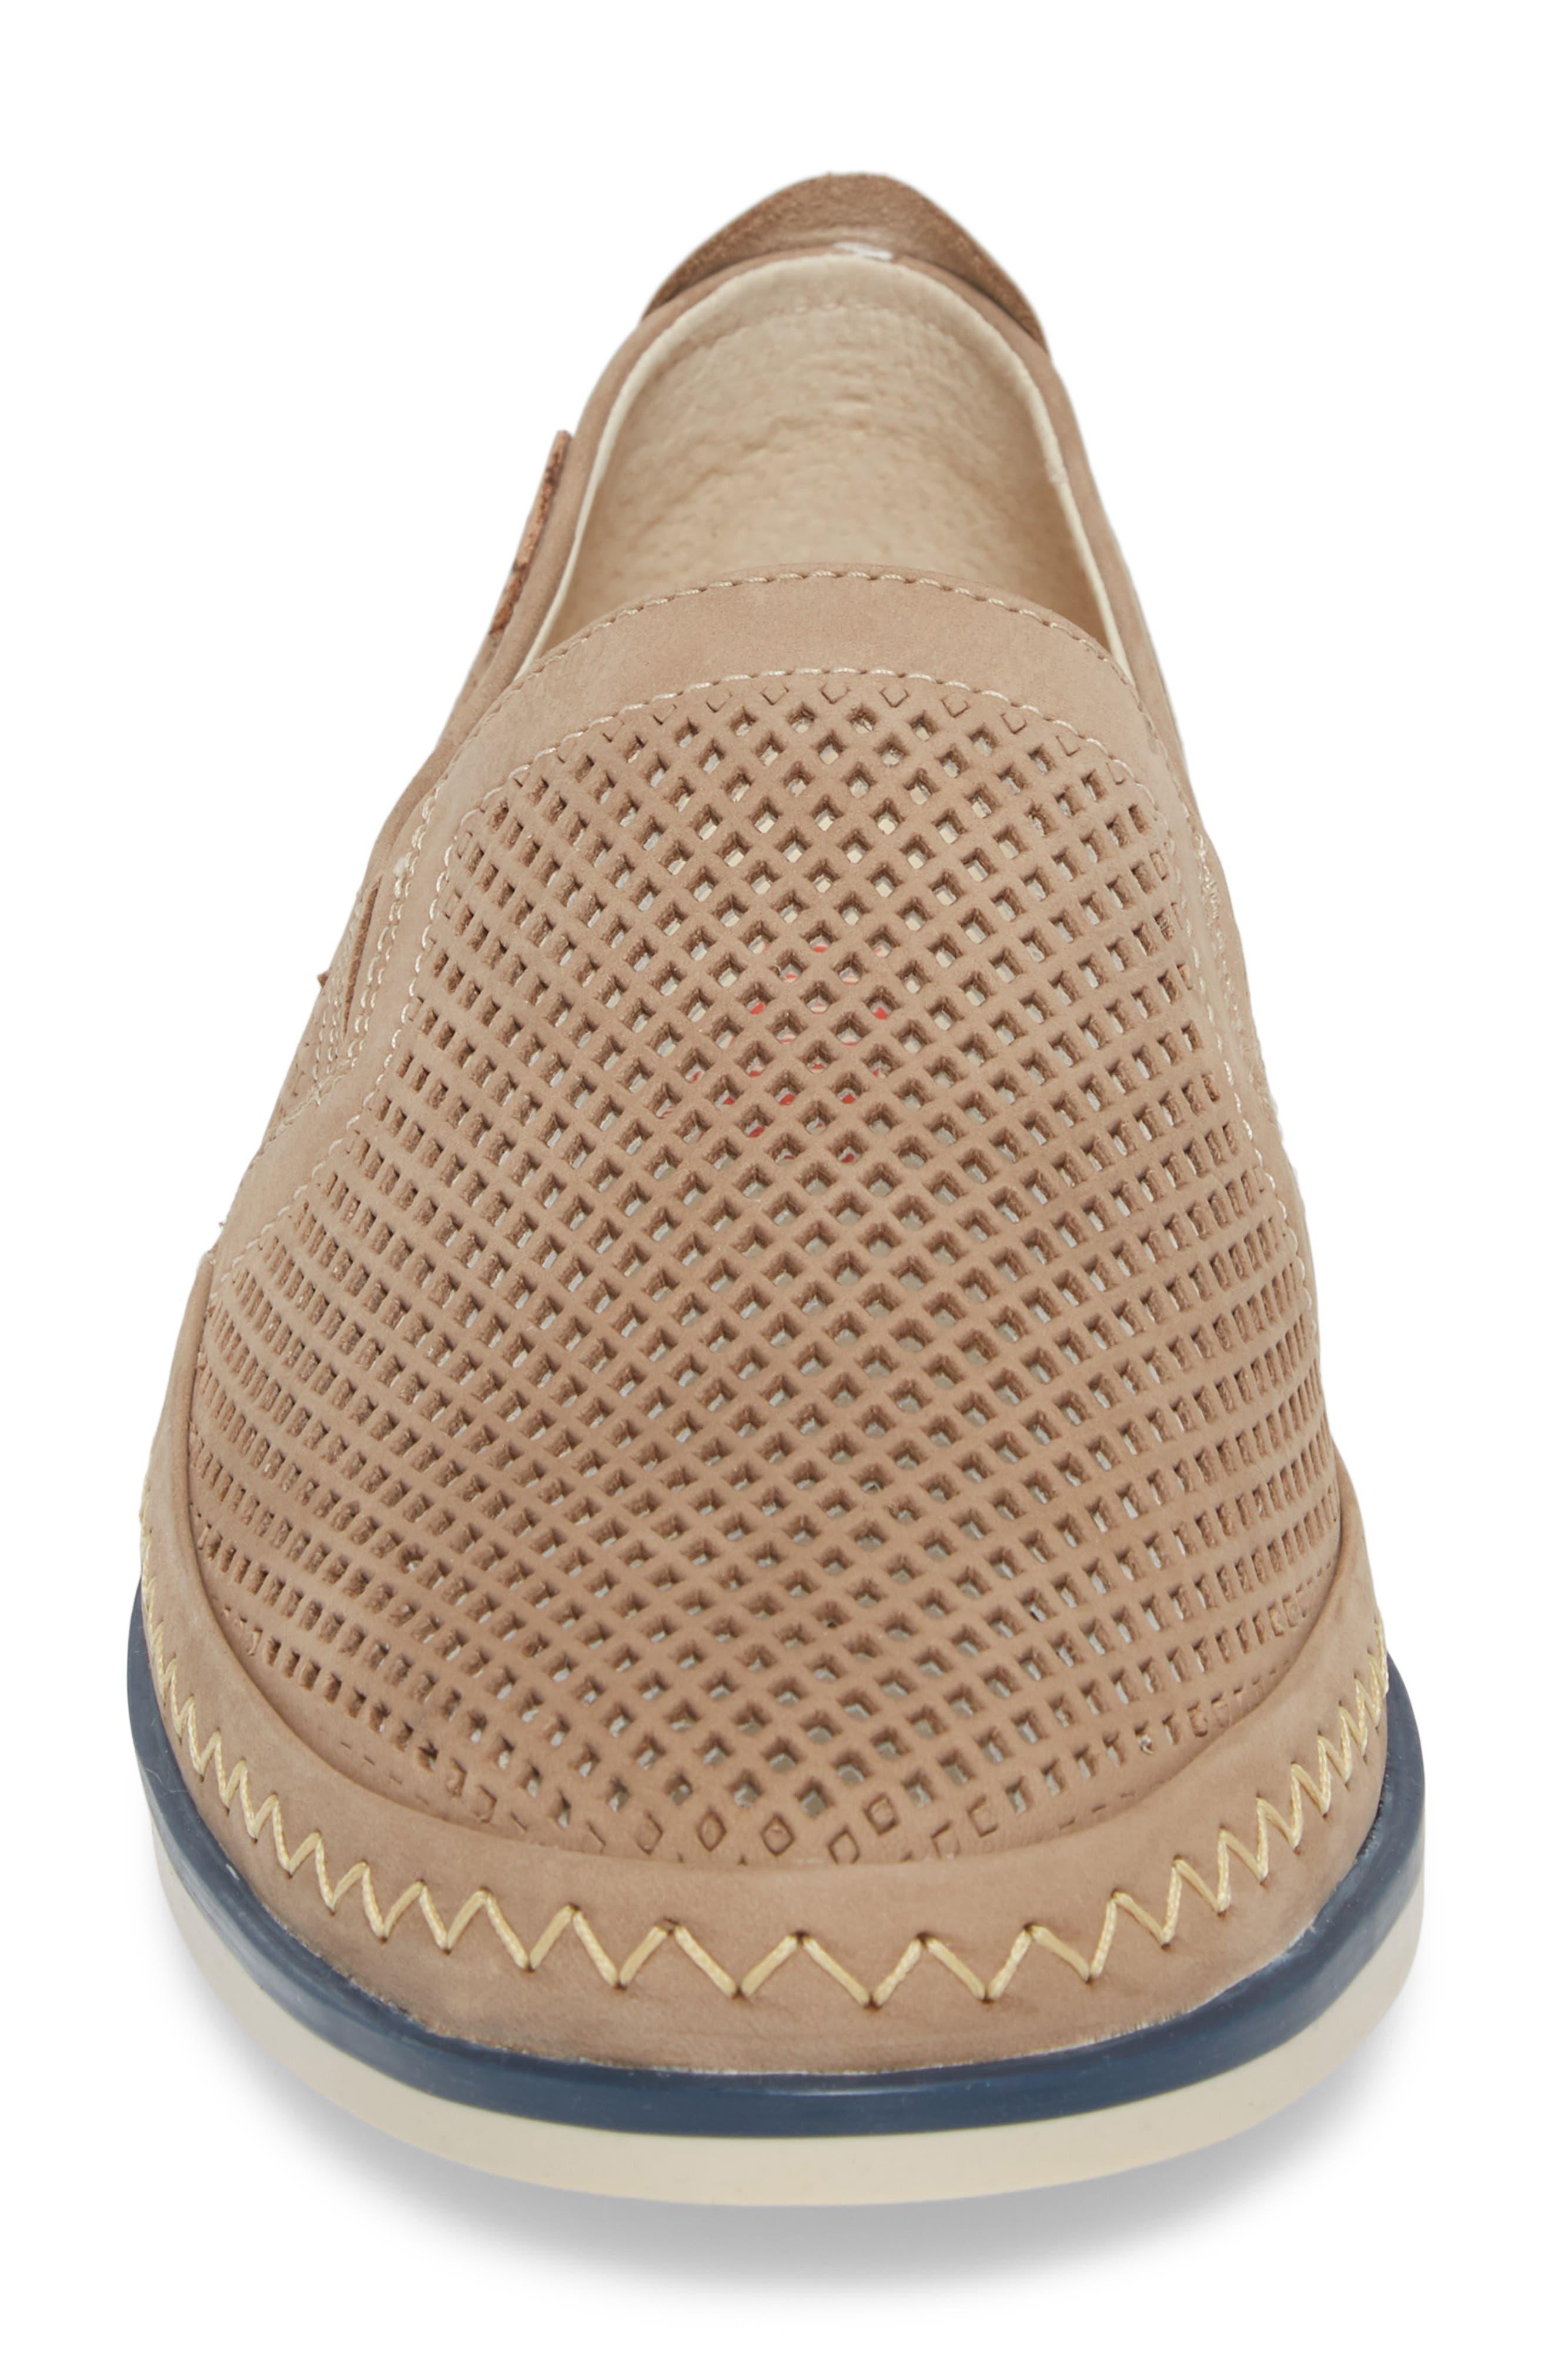 Linares Slip-On Loafer,                             Alternate thumbnail 4, color,                             250